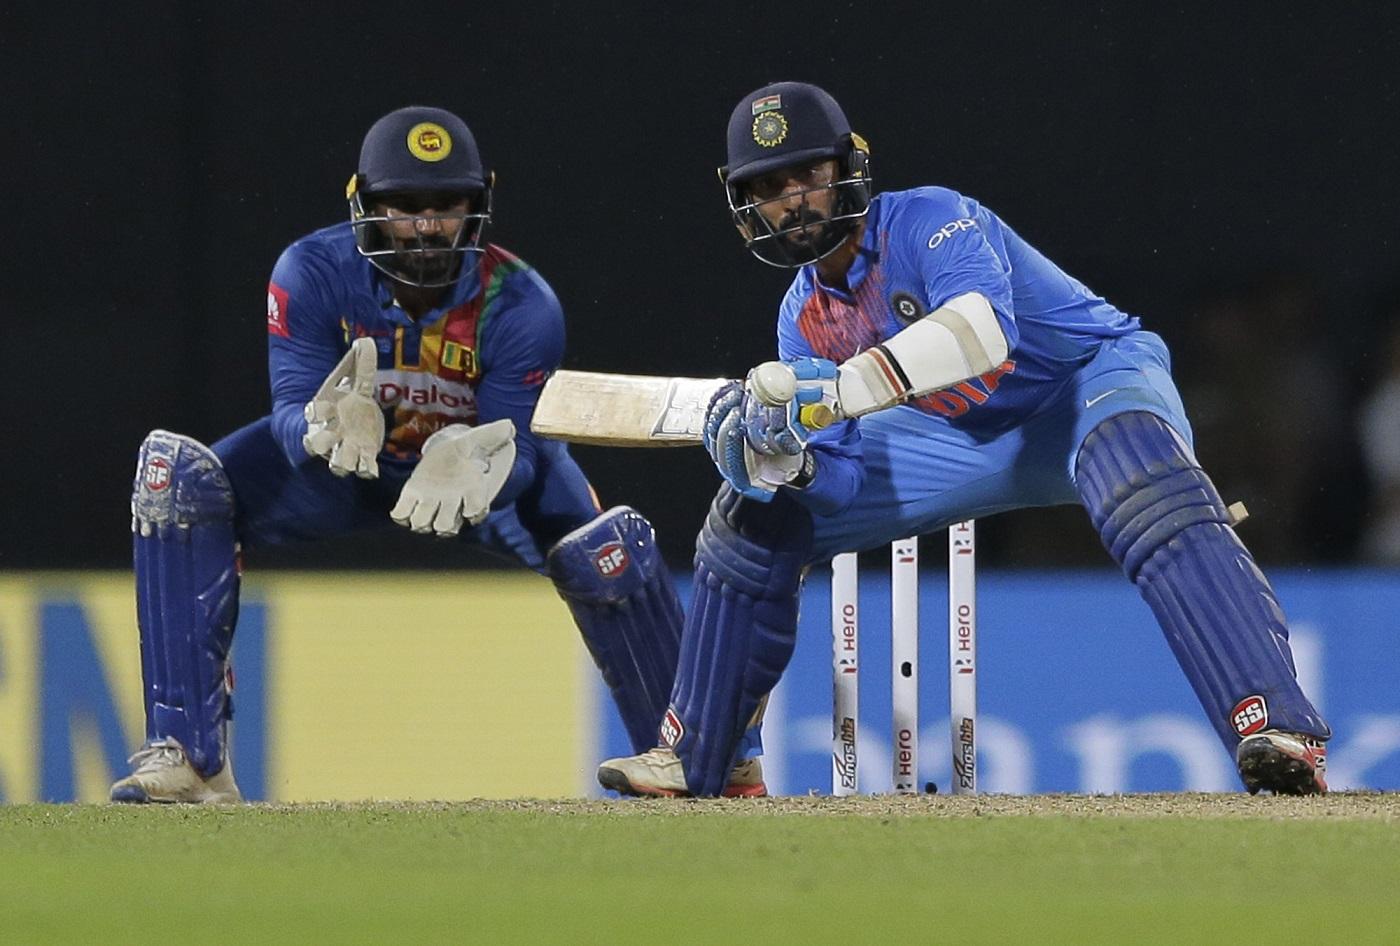 Sri Lanka vs India 4th T20 Highlights 2018